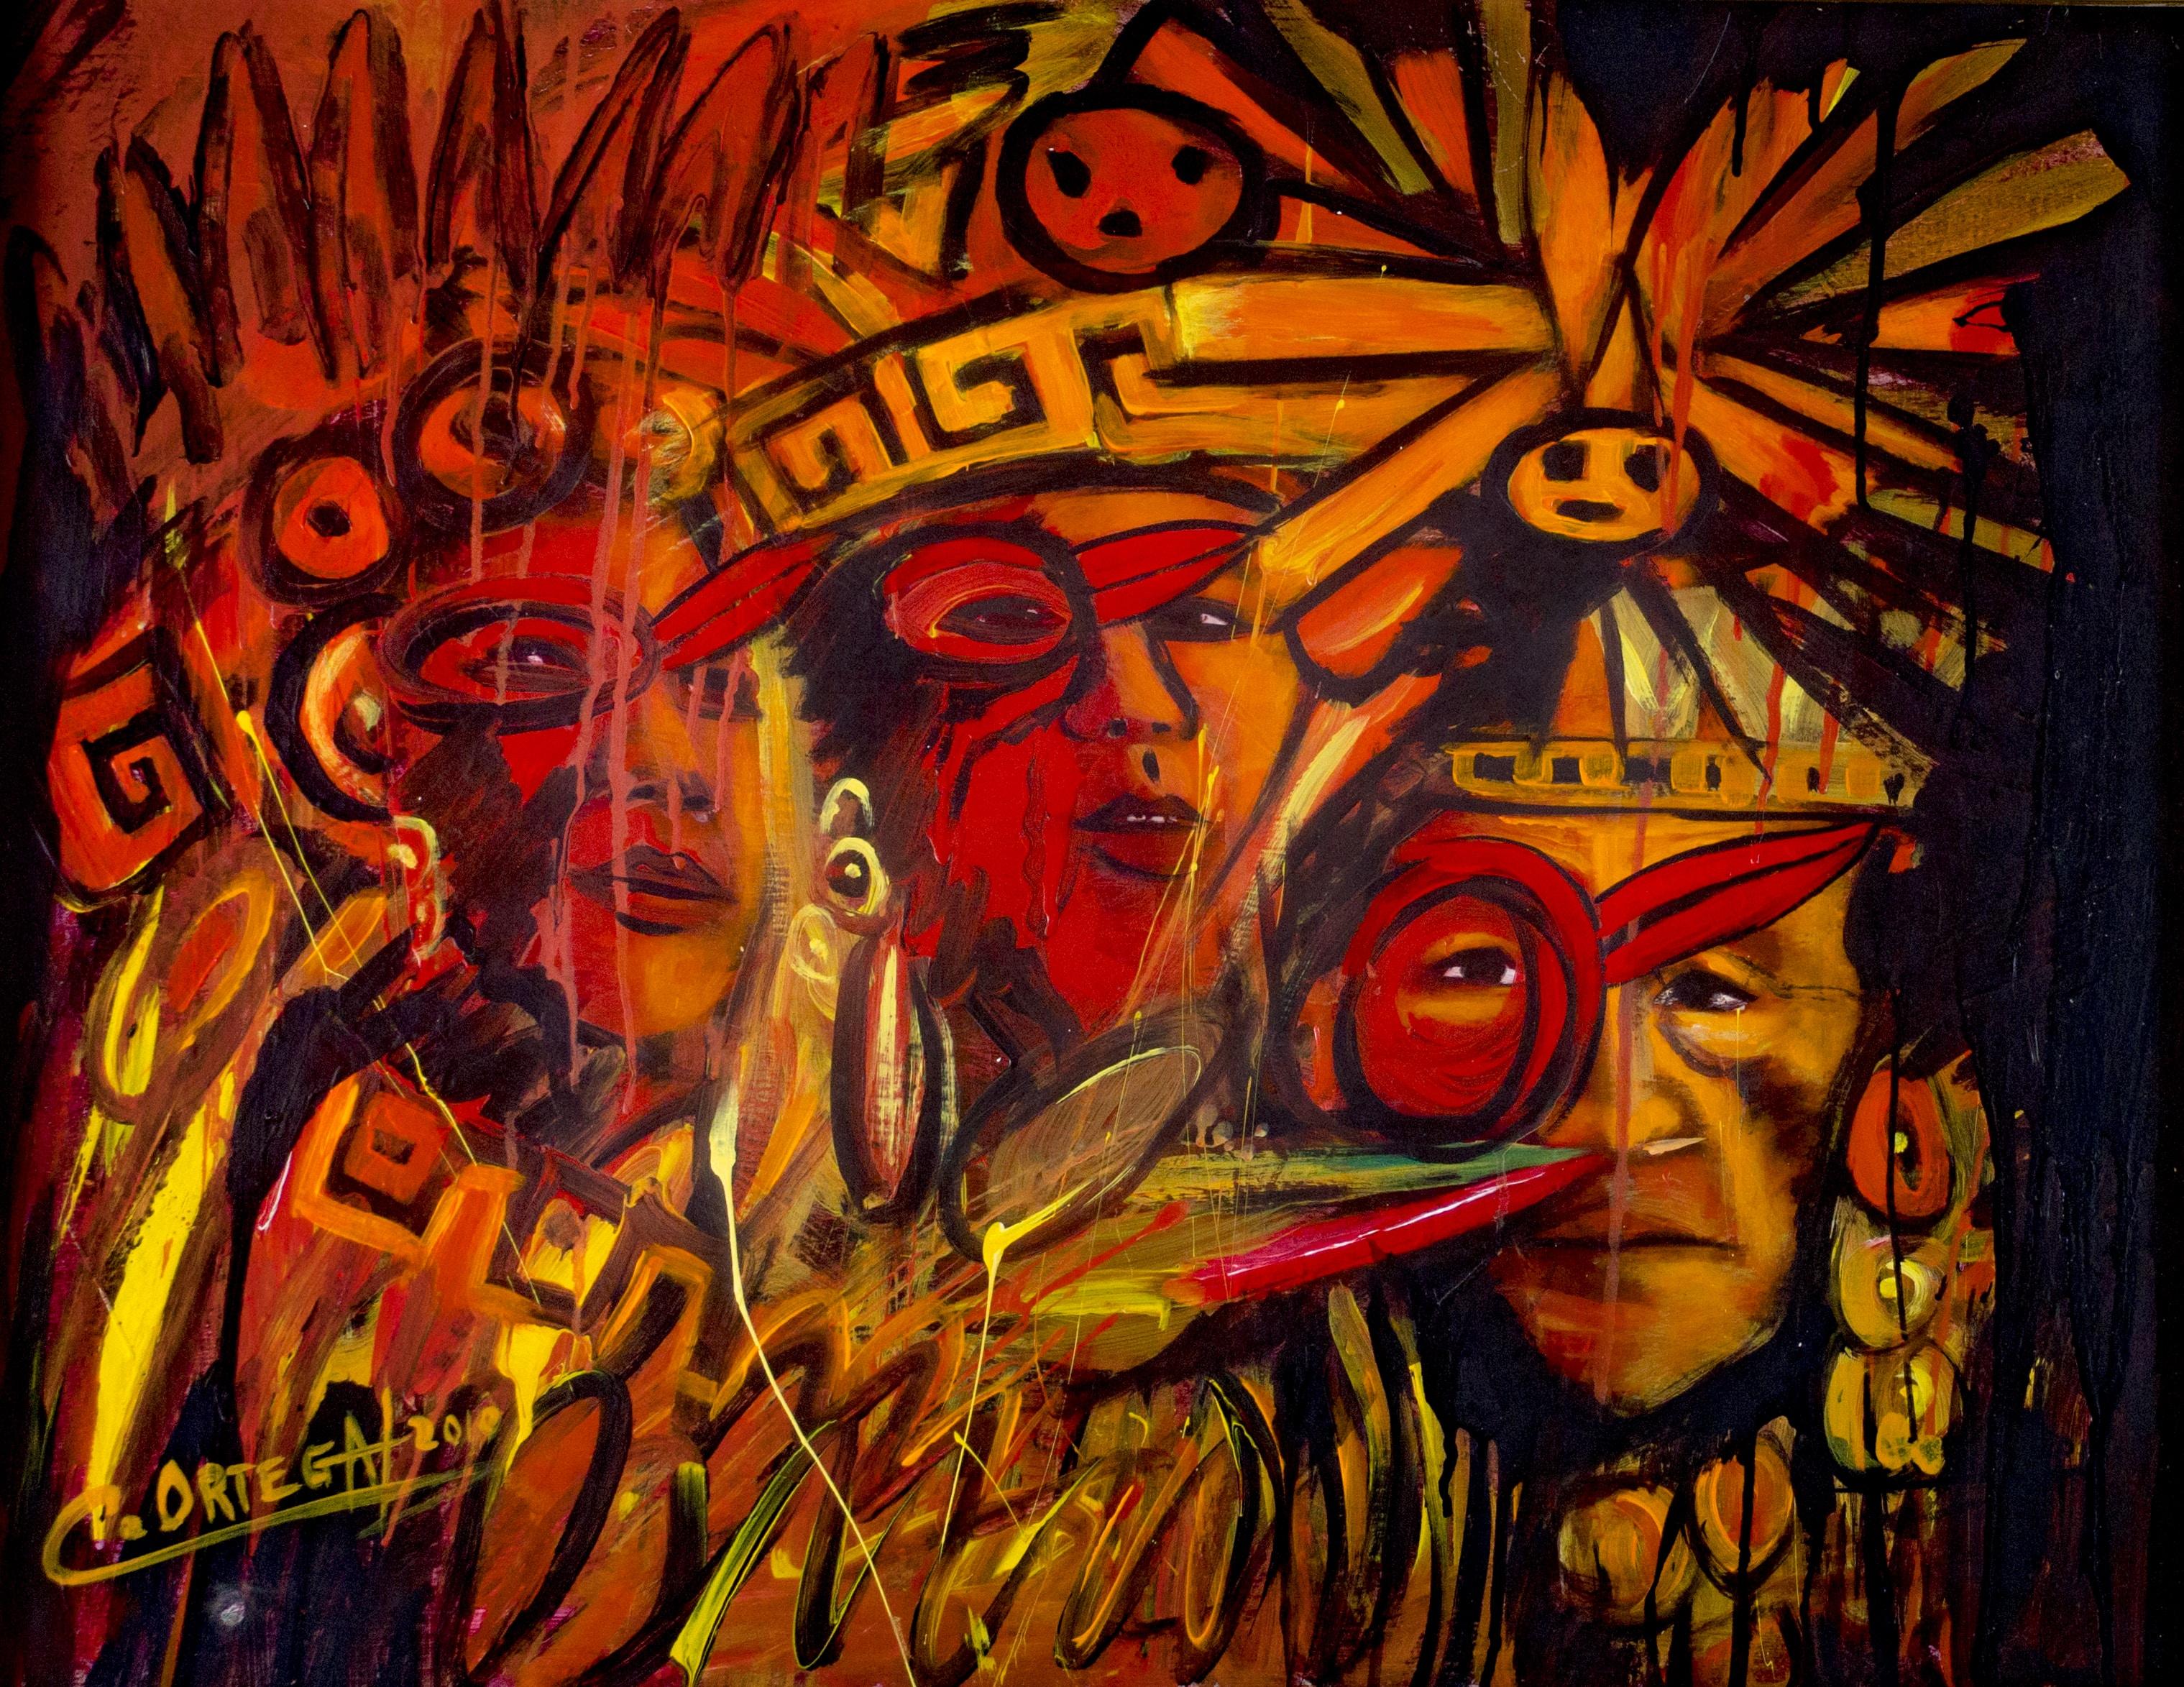 Free Unsplash photo from Famous Artist Painter Ortega Maila